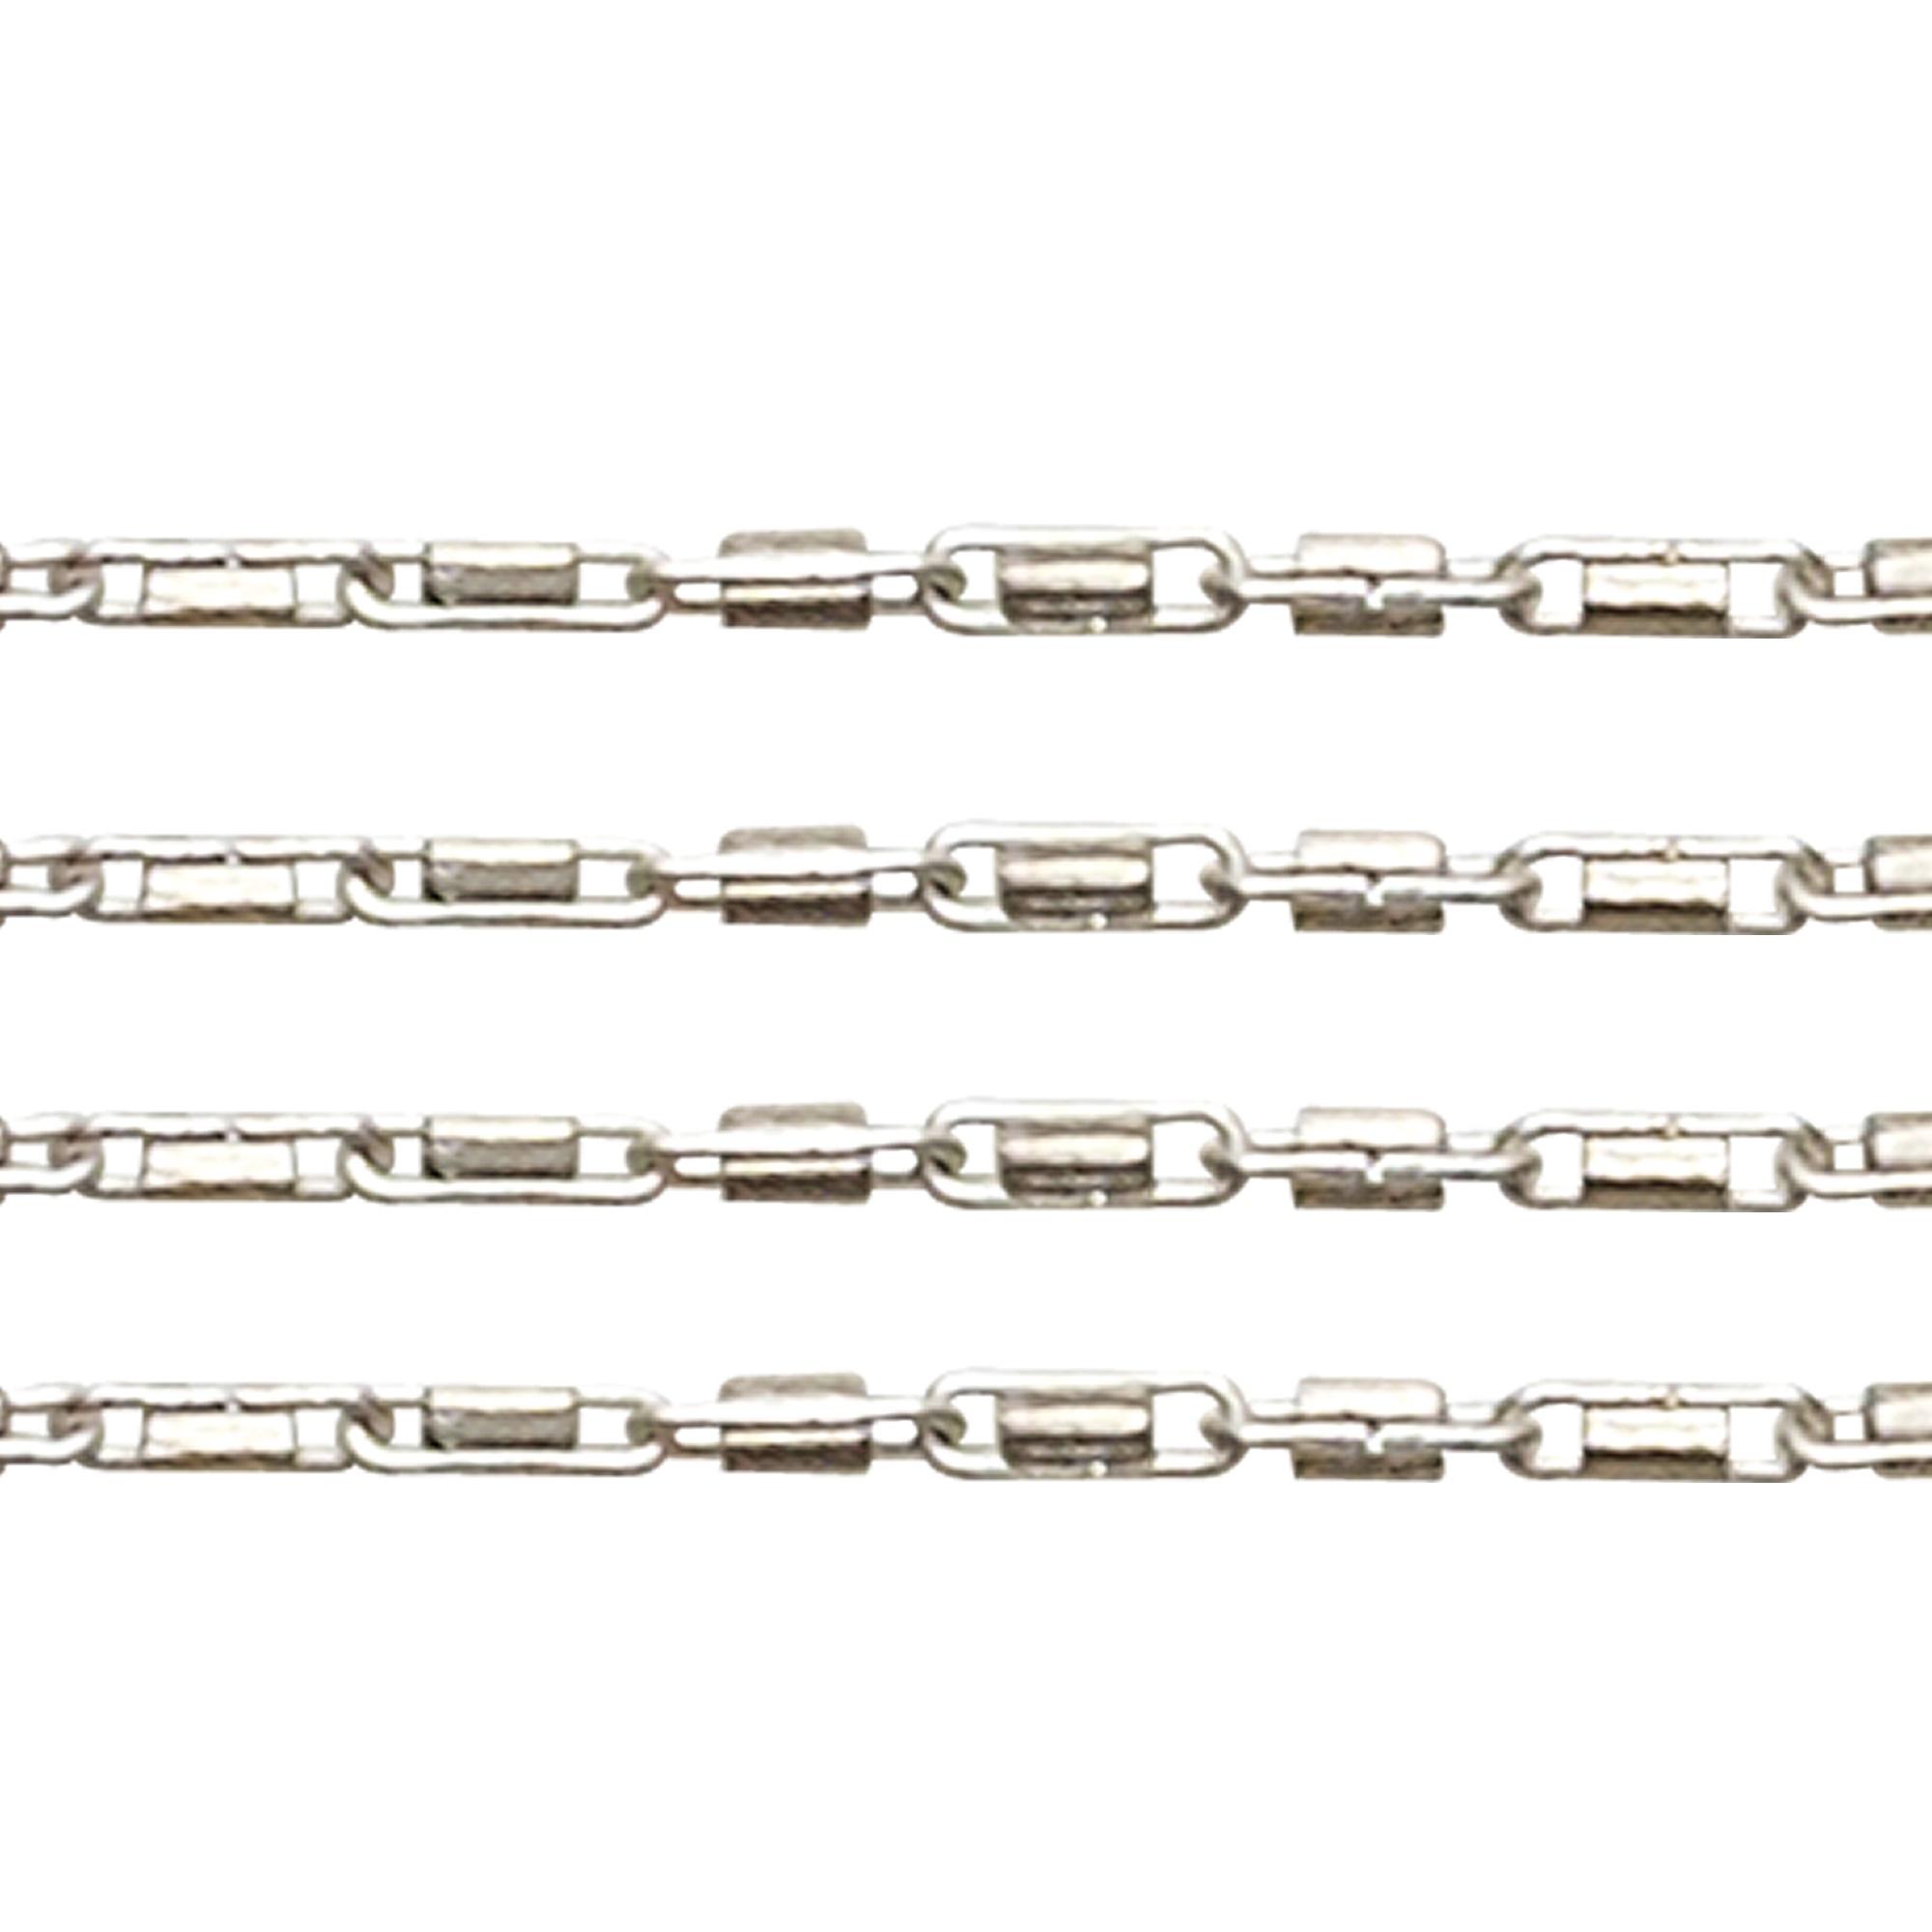 LX803元寶鏈扣鏈機樣品.JPG